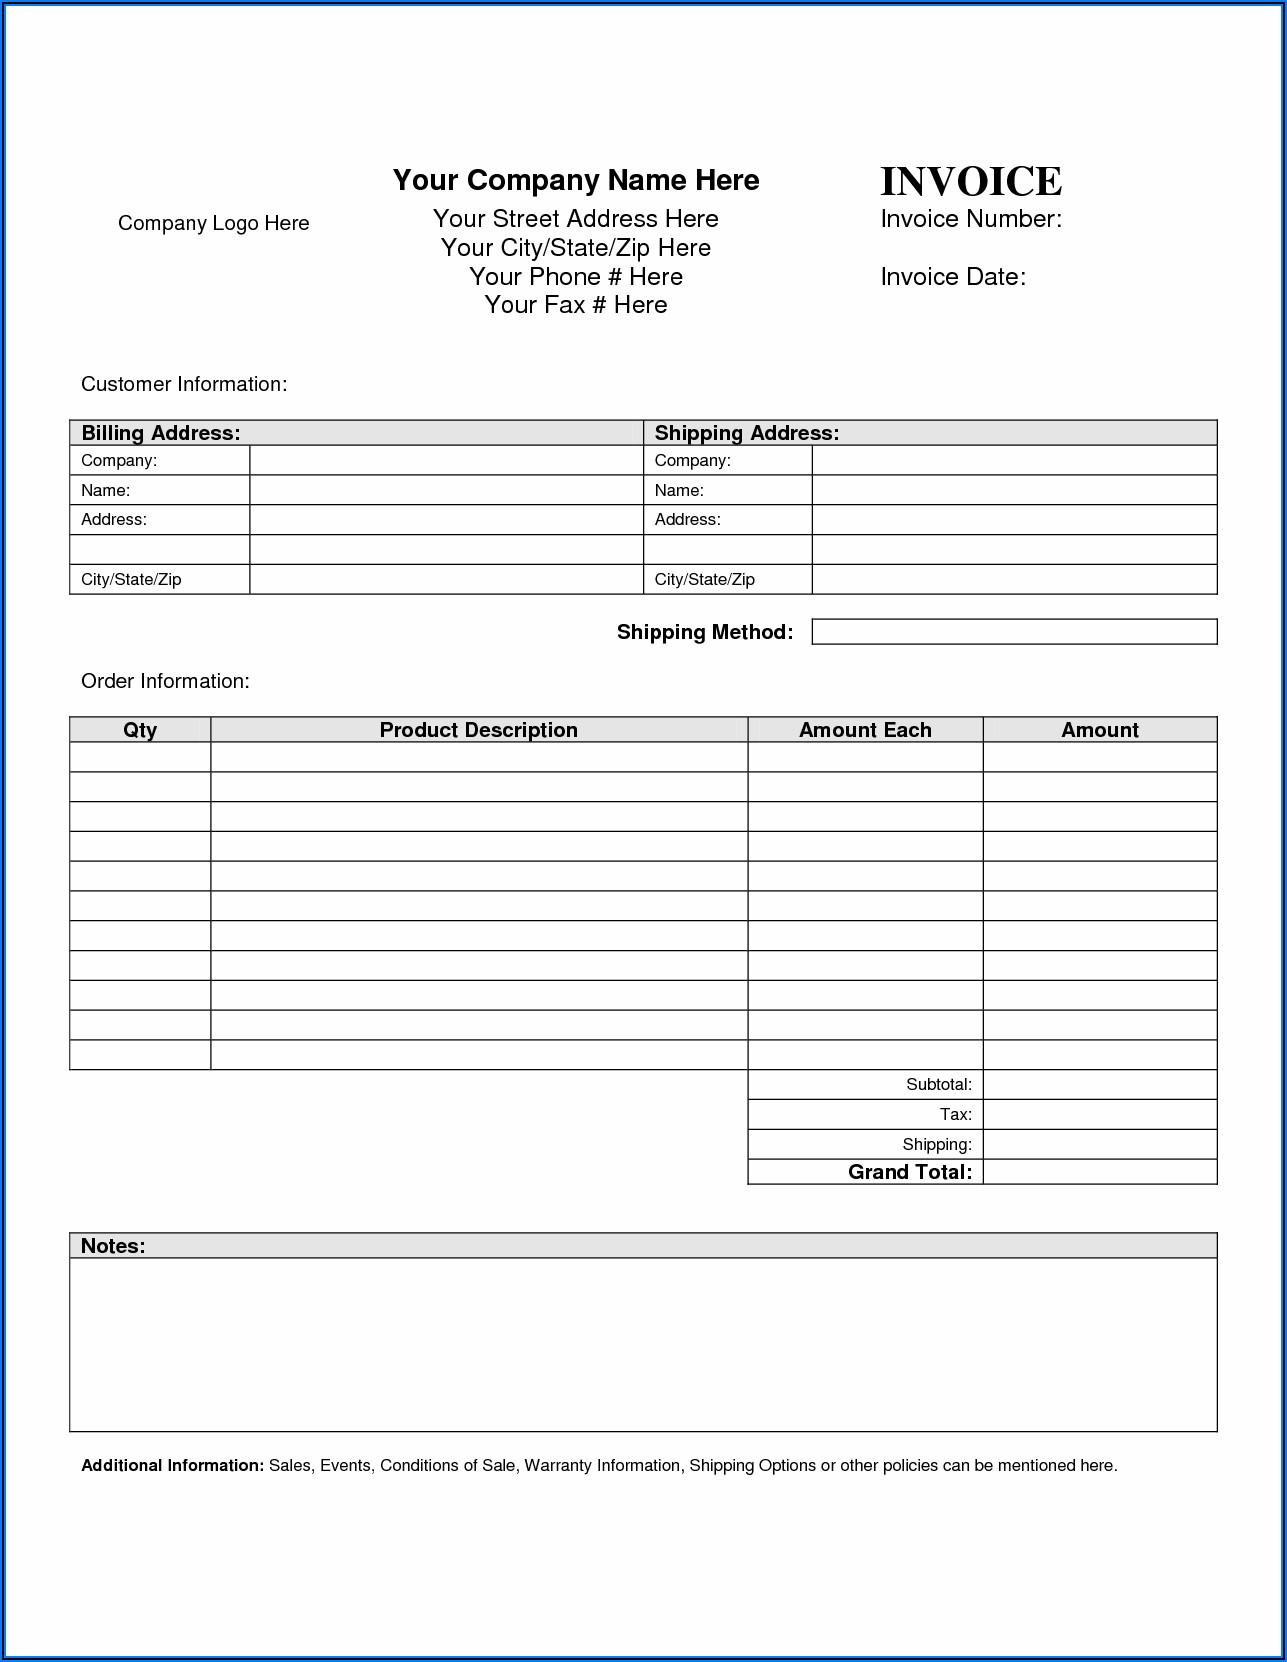 Free Invoice Template Microsoft Word